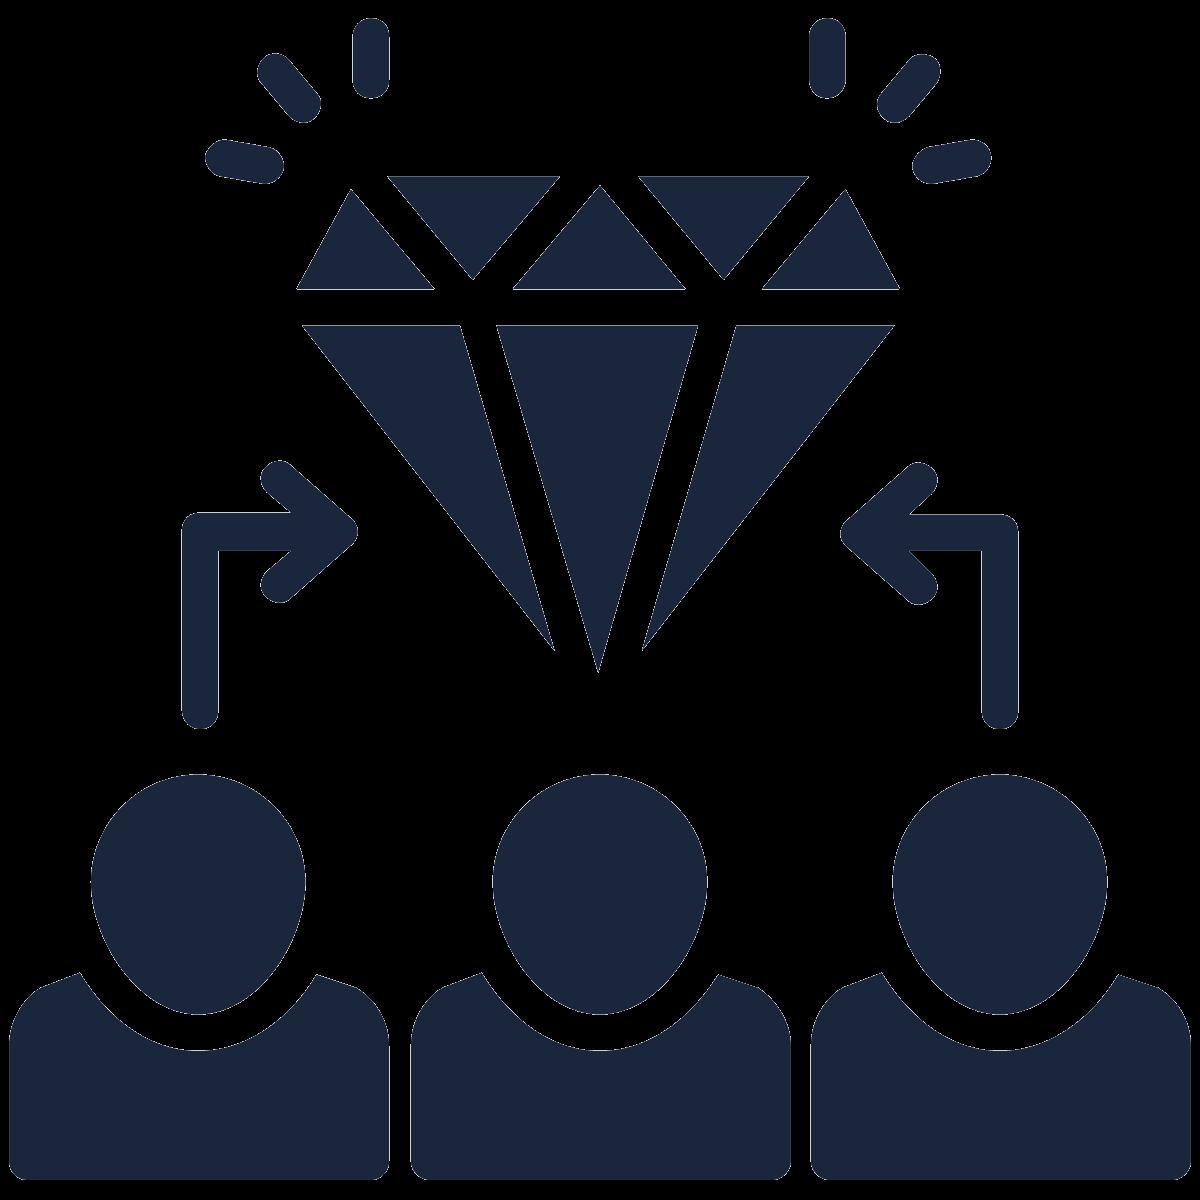 team performances icon